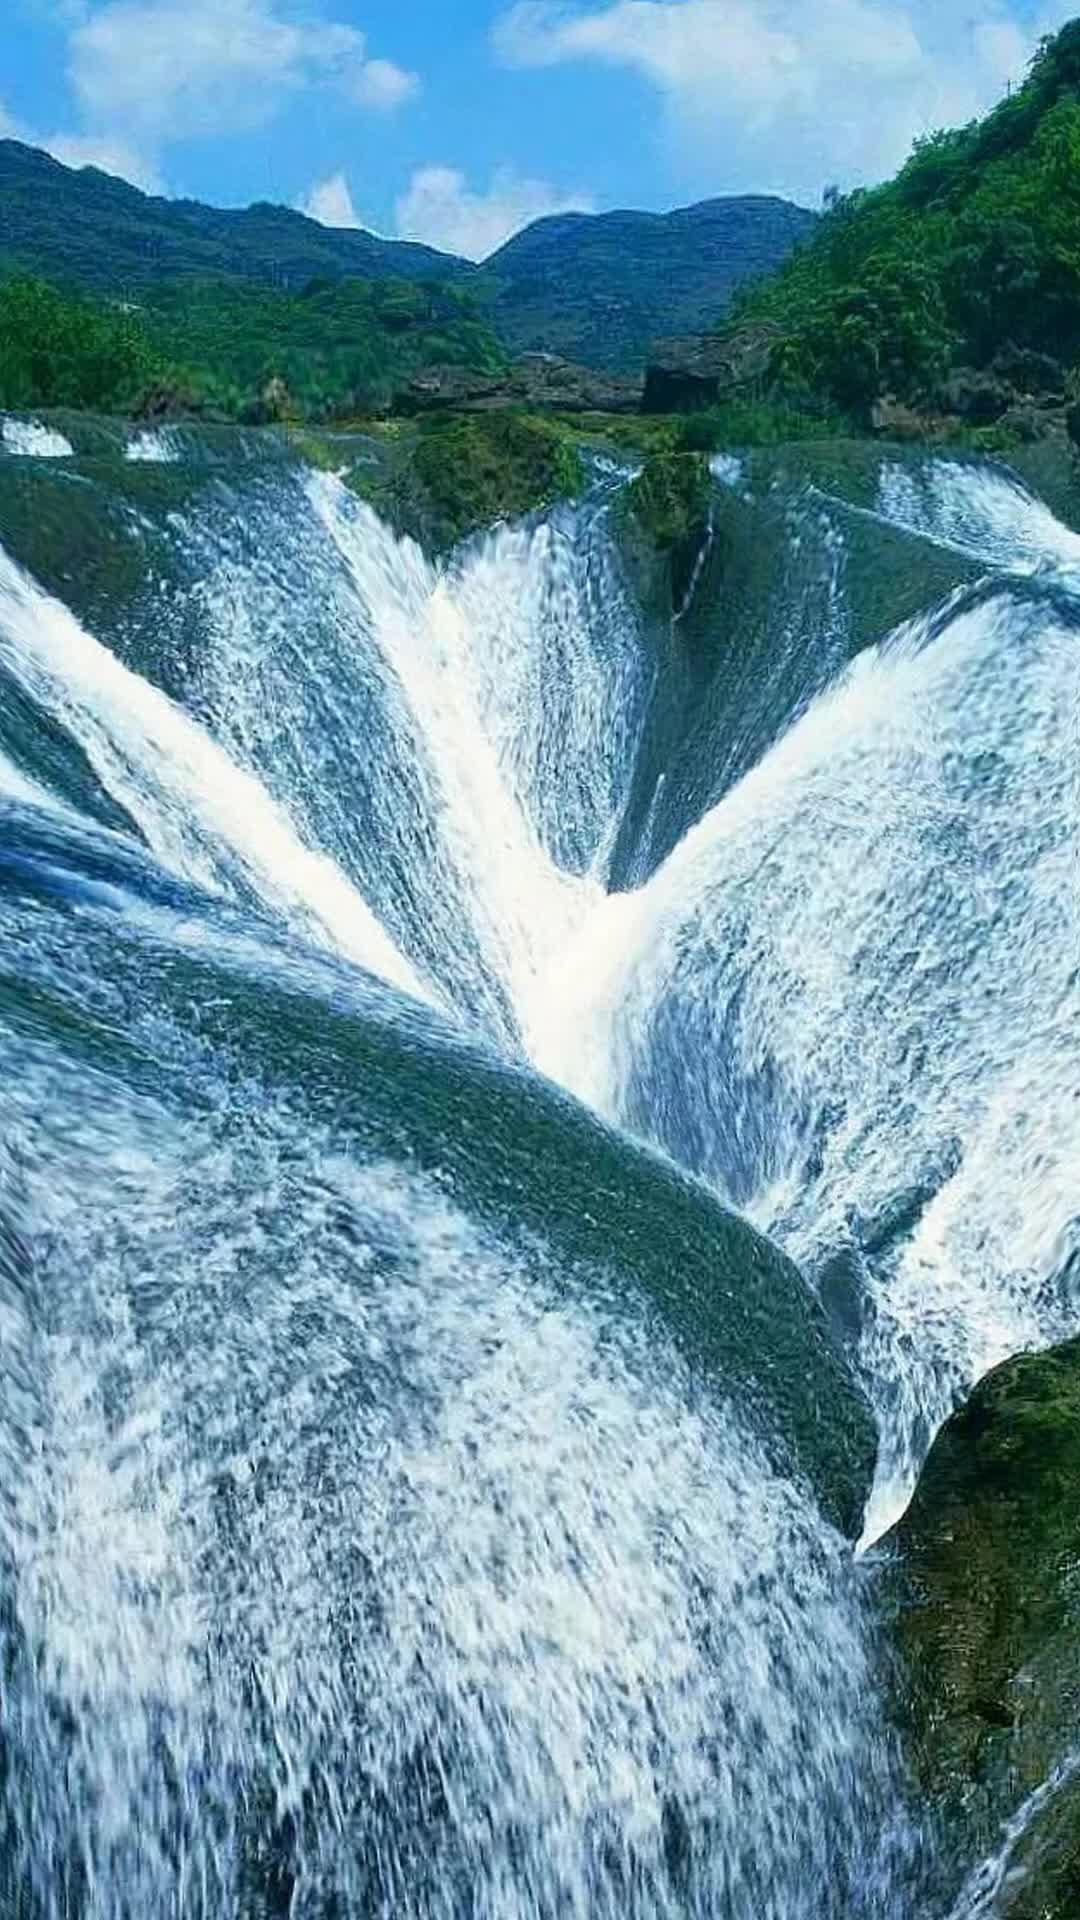 china, mirage, nature, trees, water, waterfall, The Pearl Waterfall, China GIFs